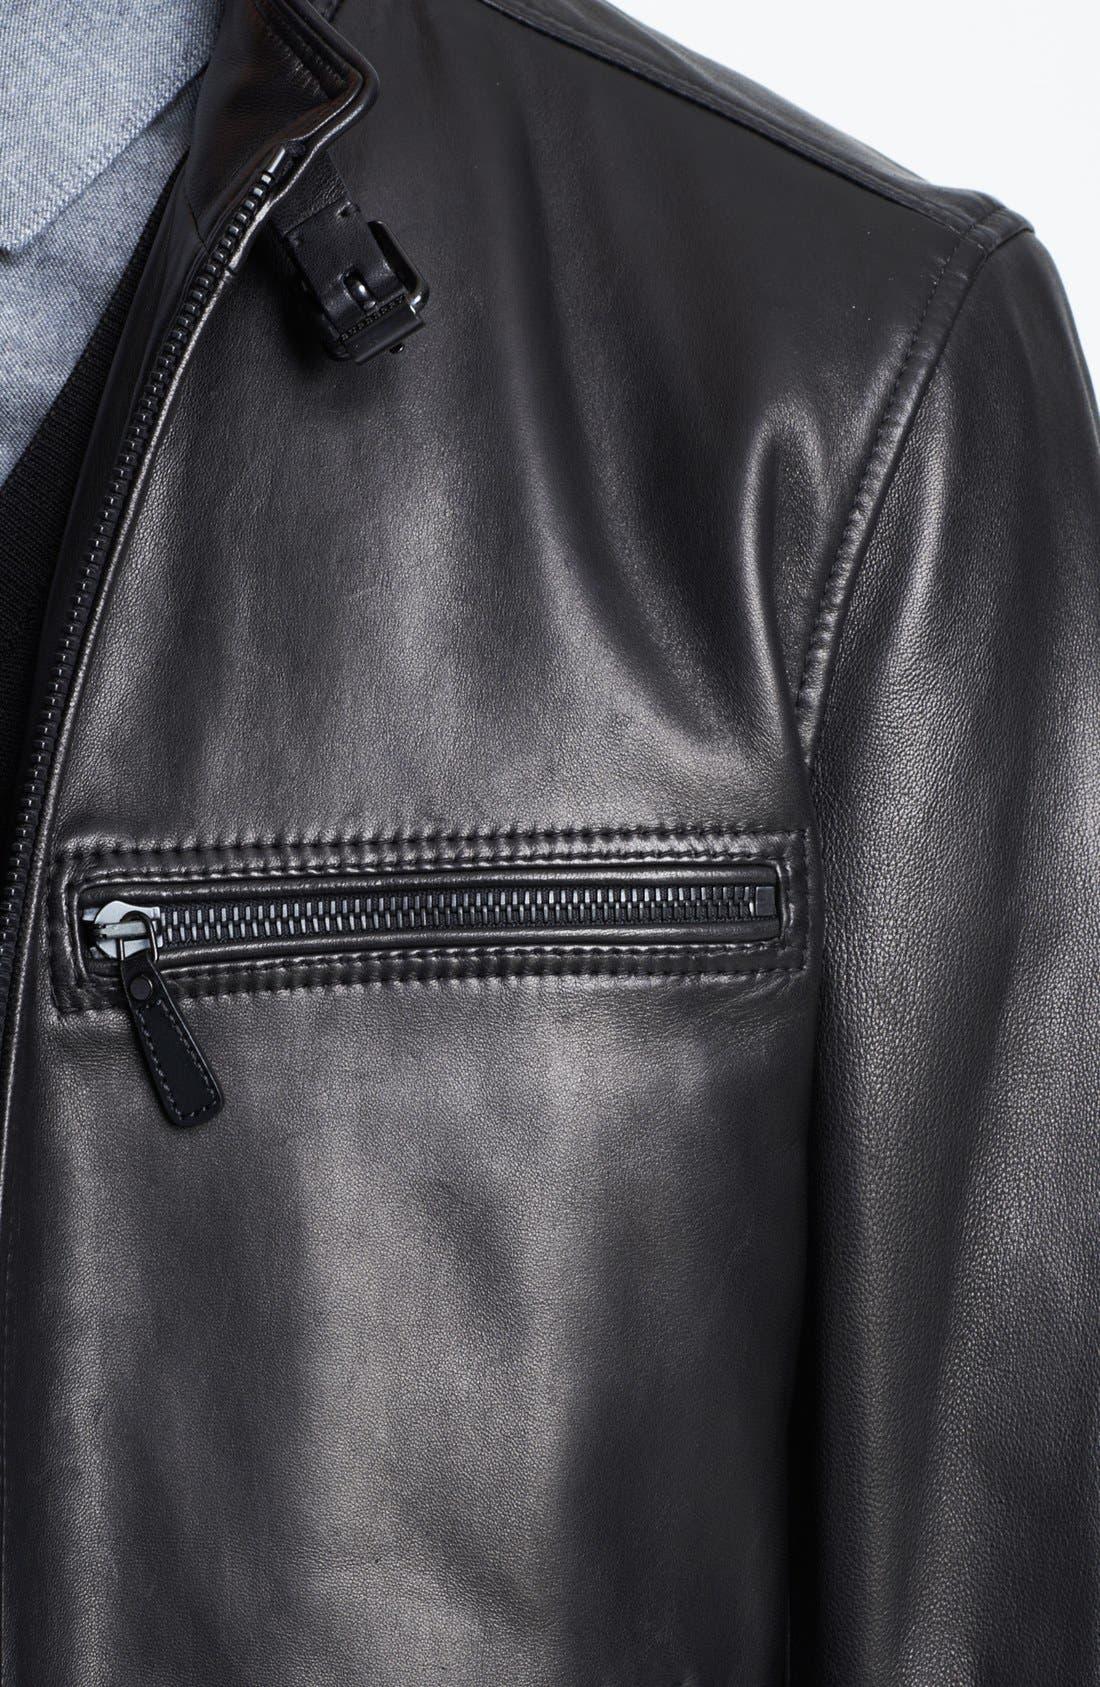 London 'Sterling' Leather Biker Jacket,                             Alternate thumbnail 2, color,                             001